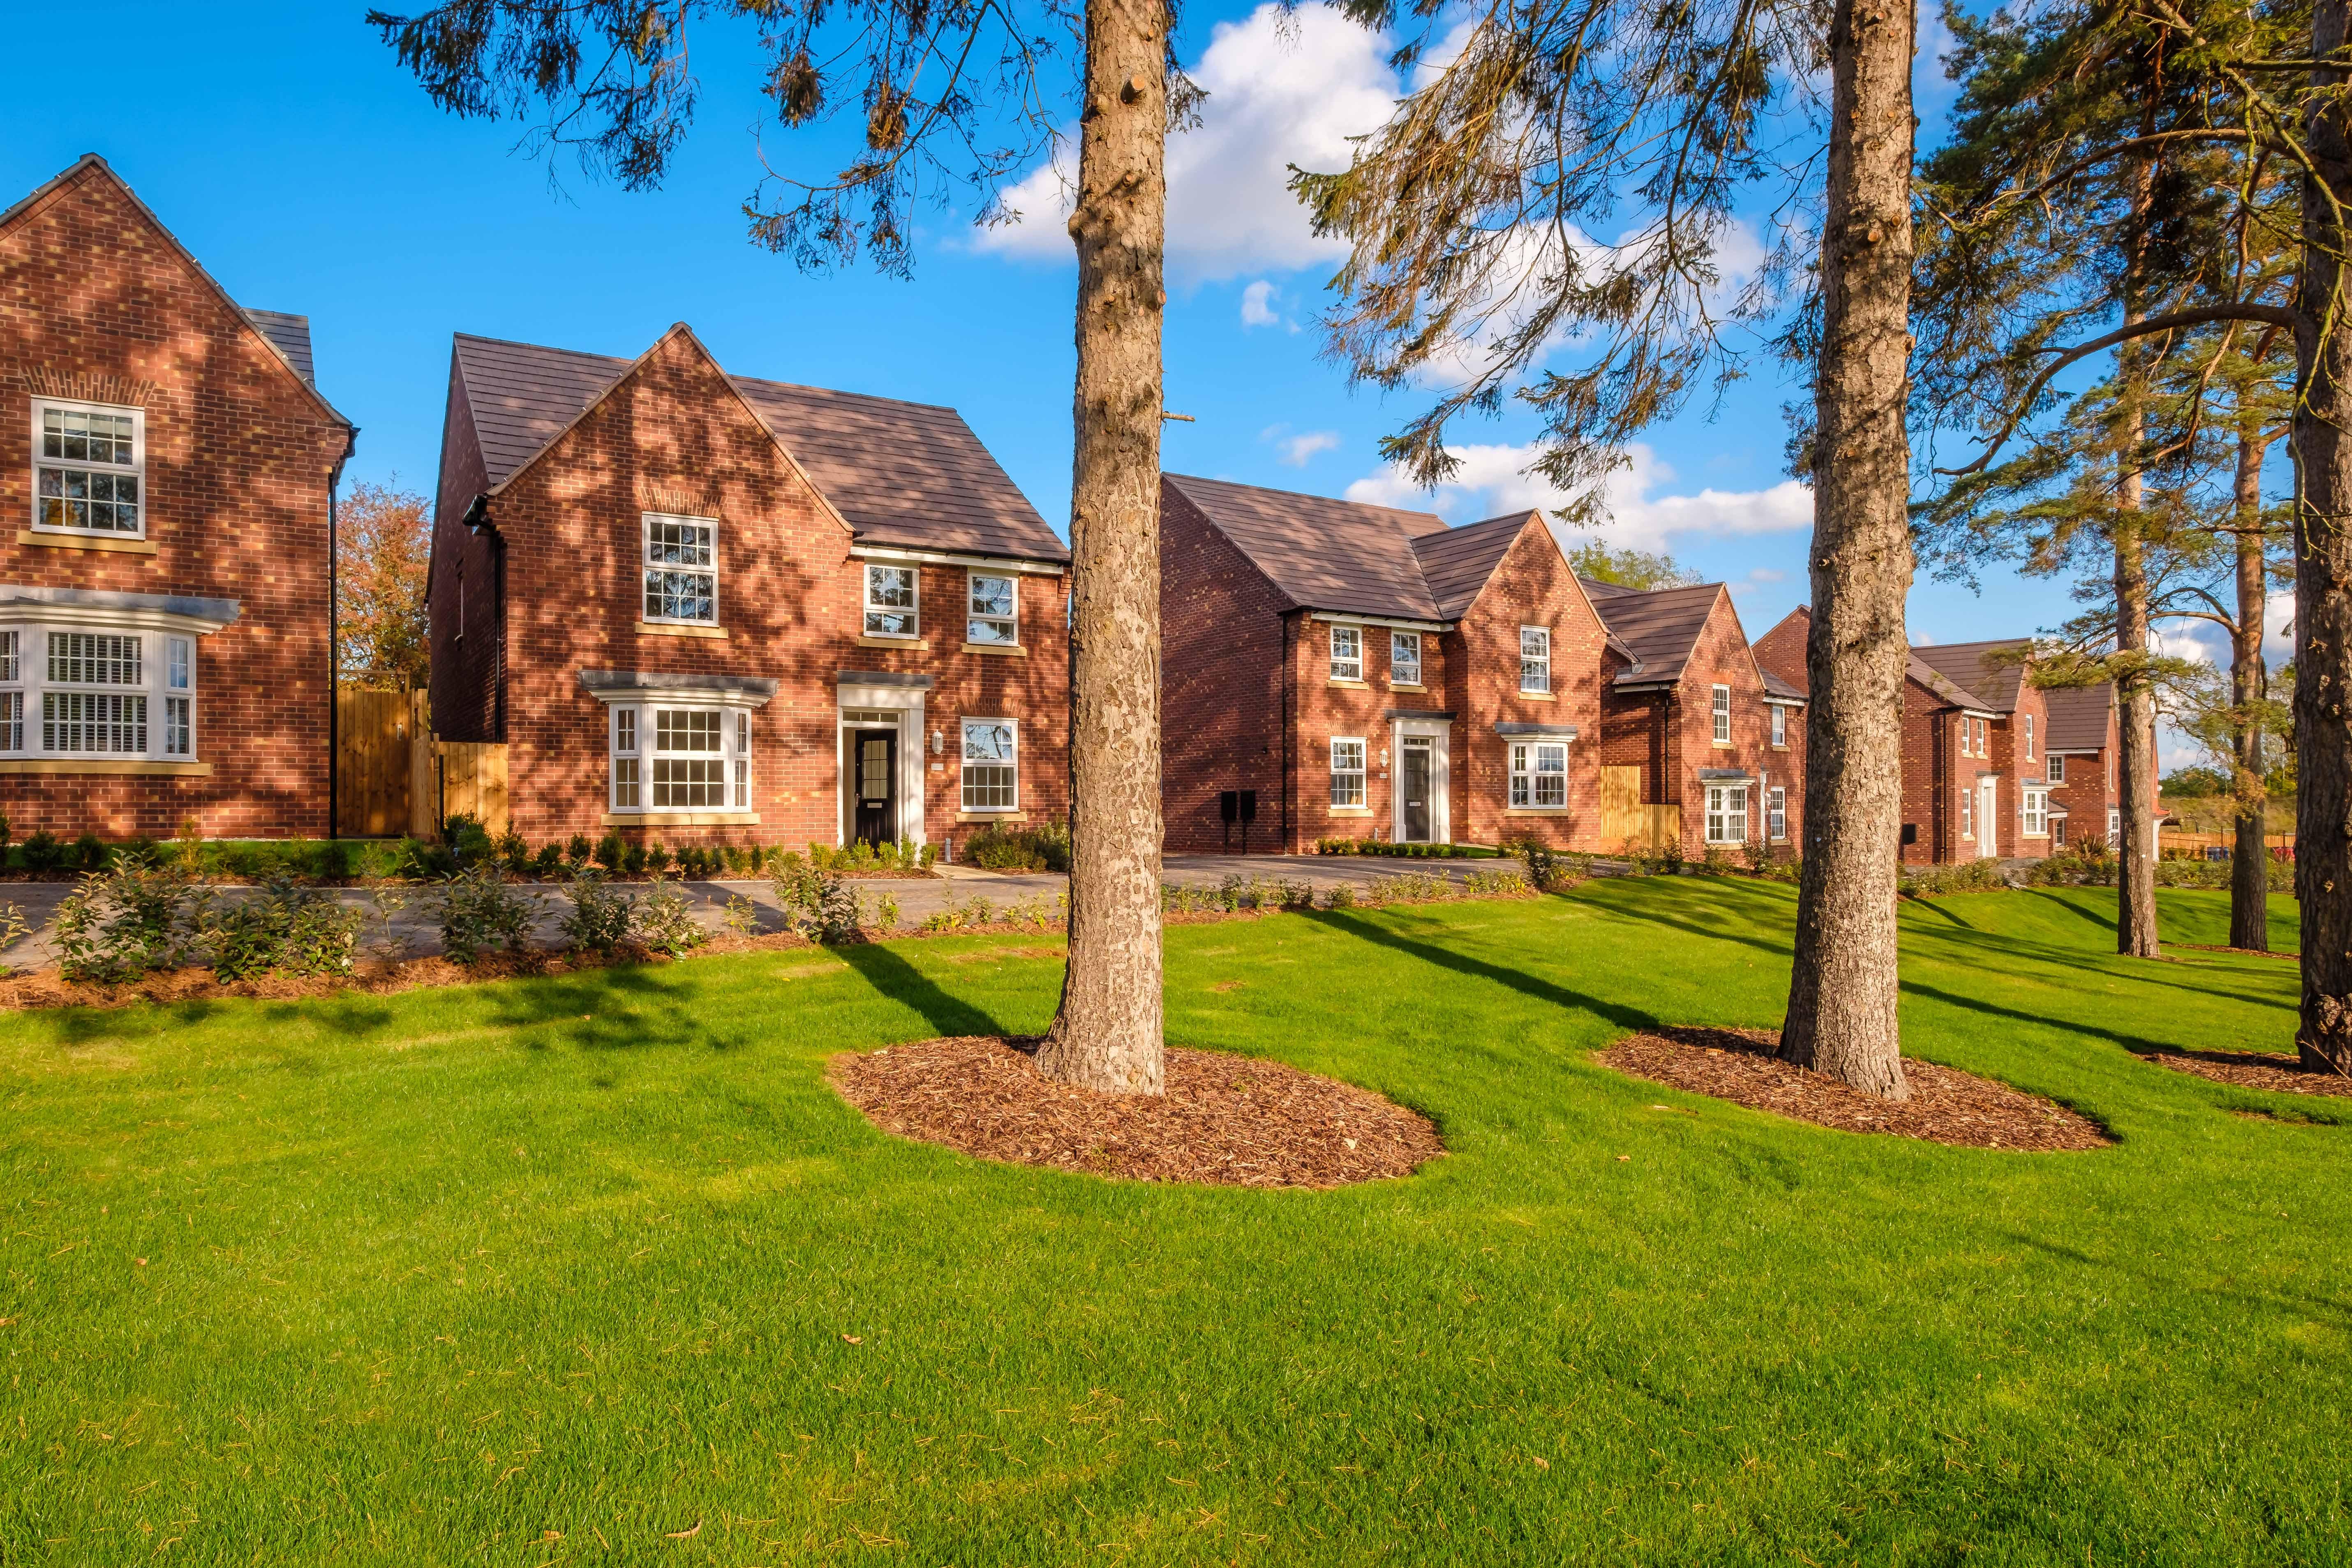 Warwickshire homebuilder reveals top reasons to move to Bishop's Itchington